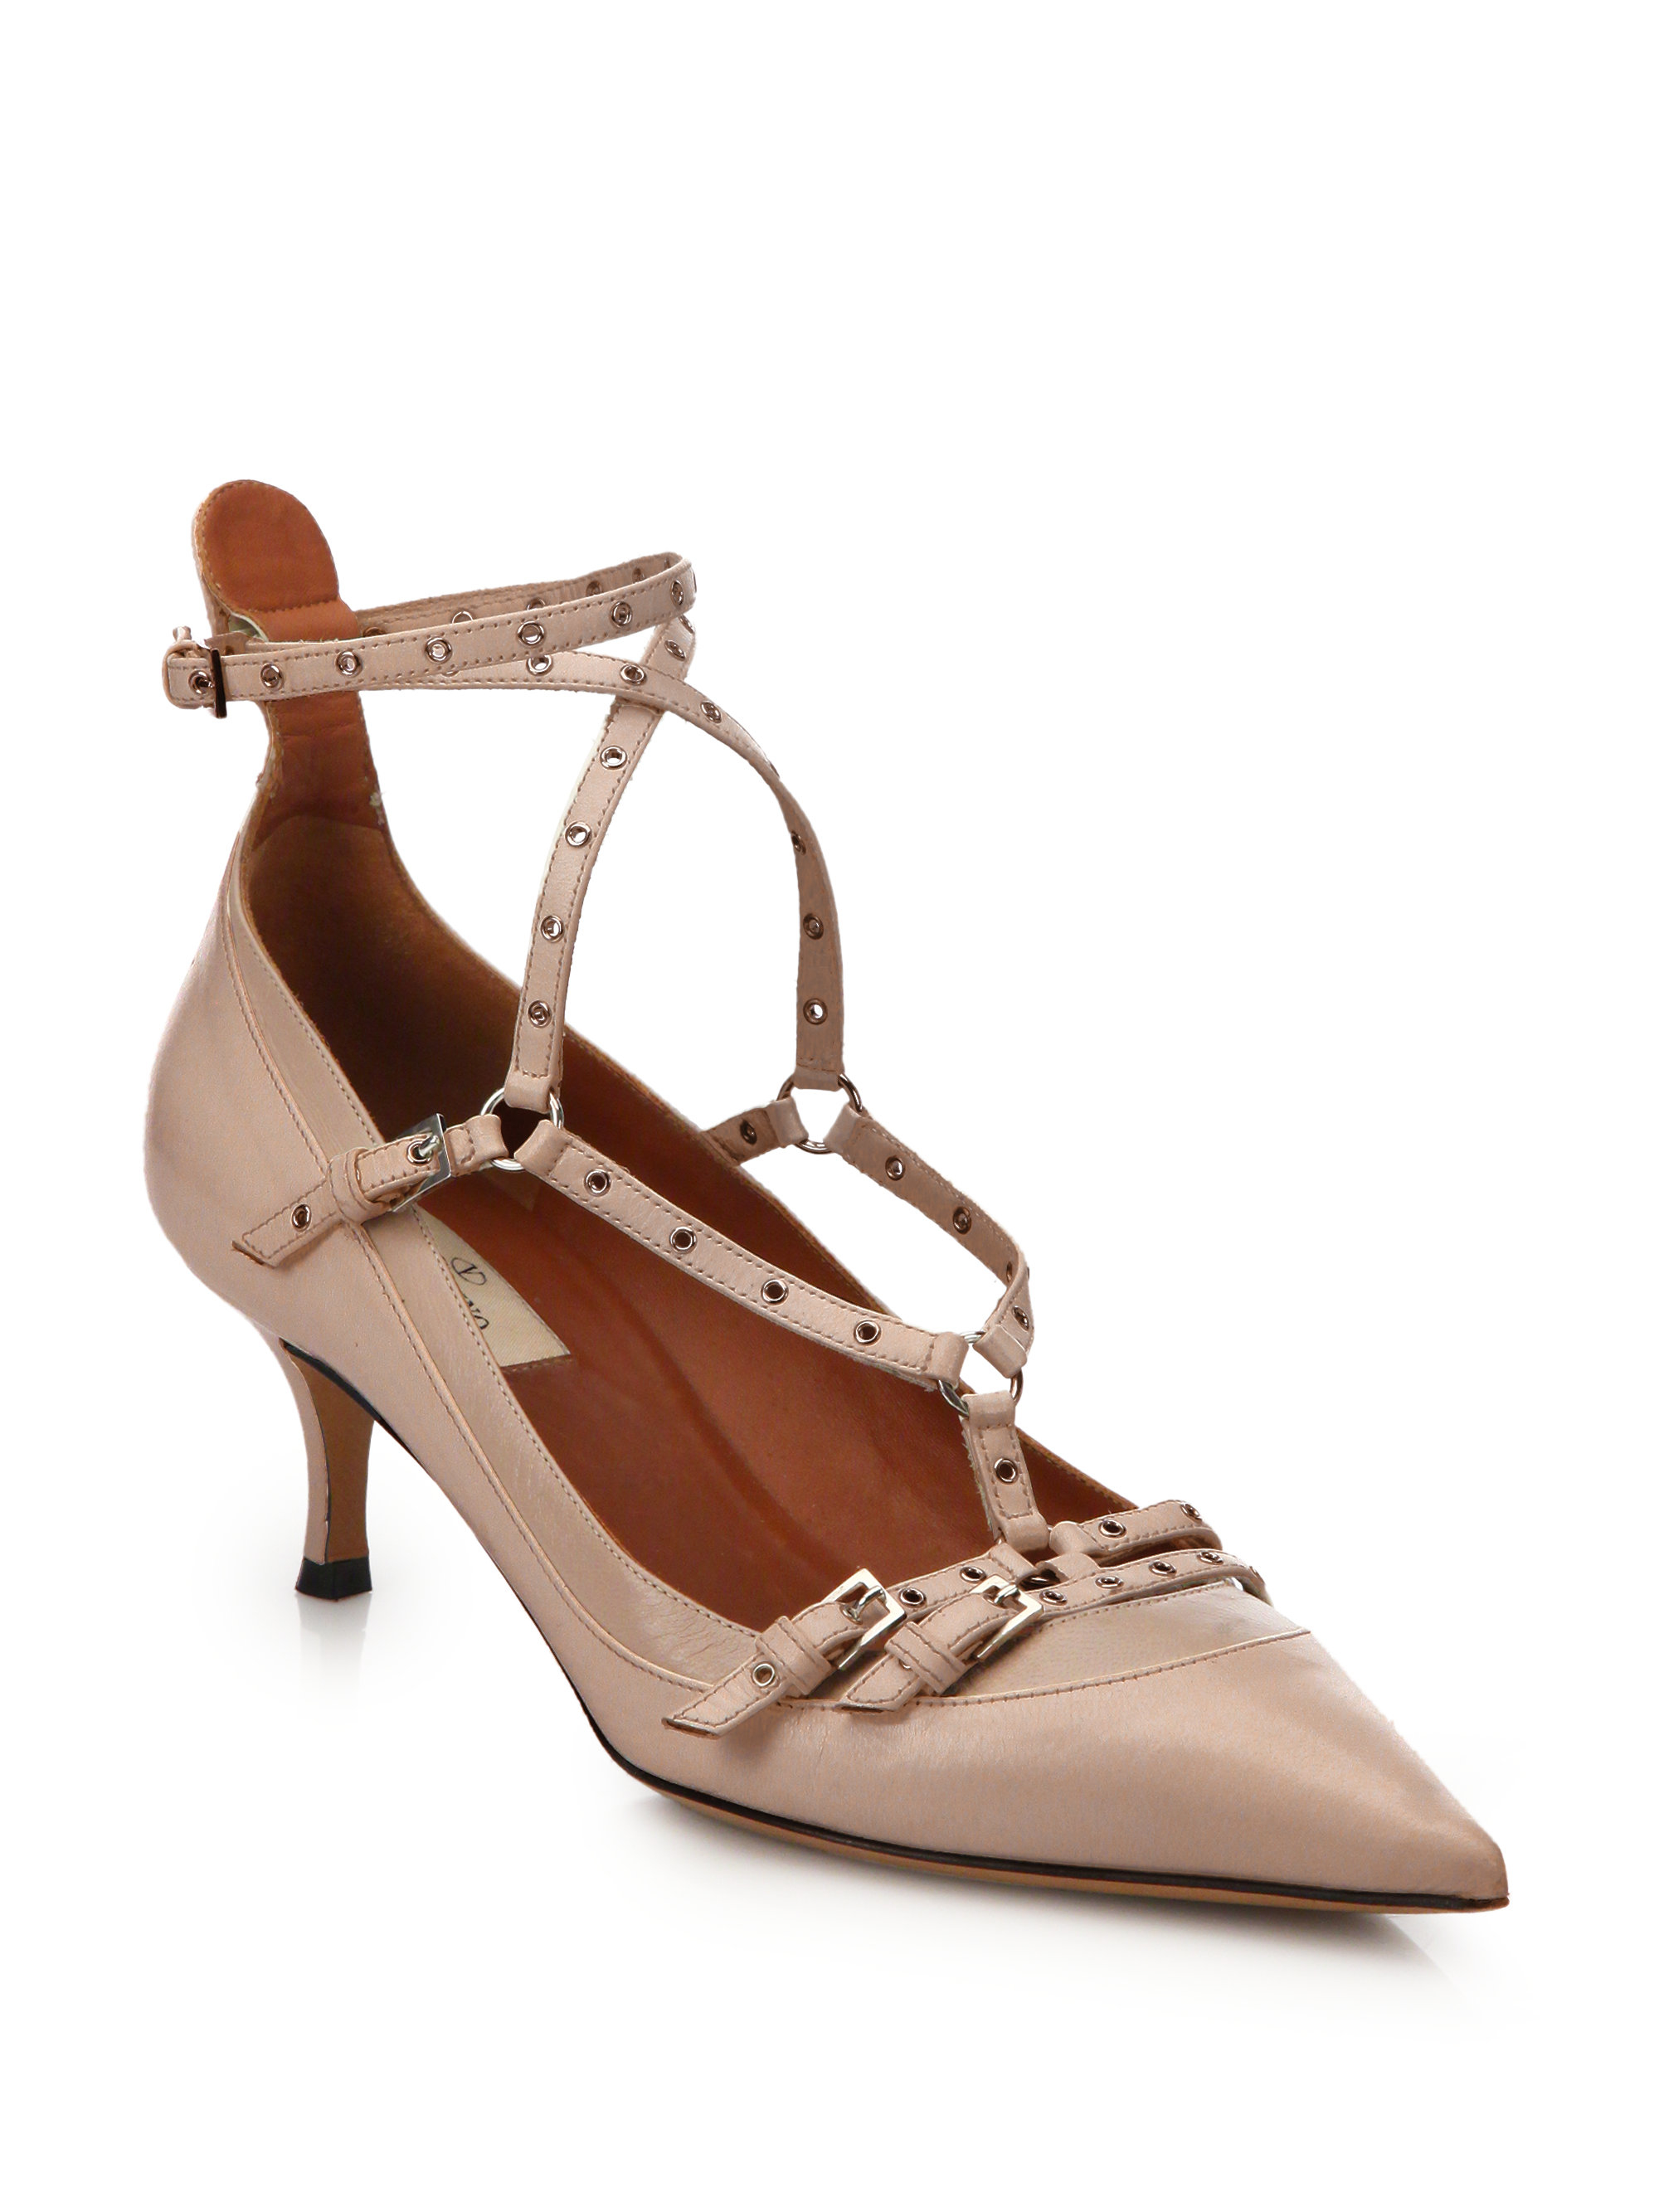 Tan Kitten Heel Shoes